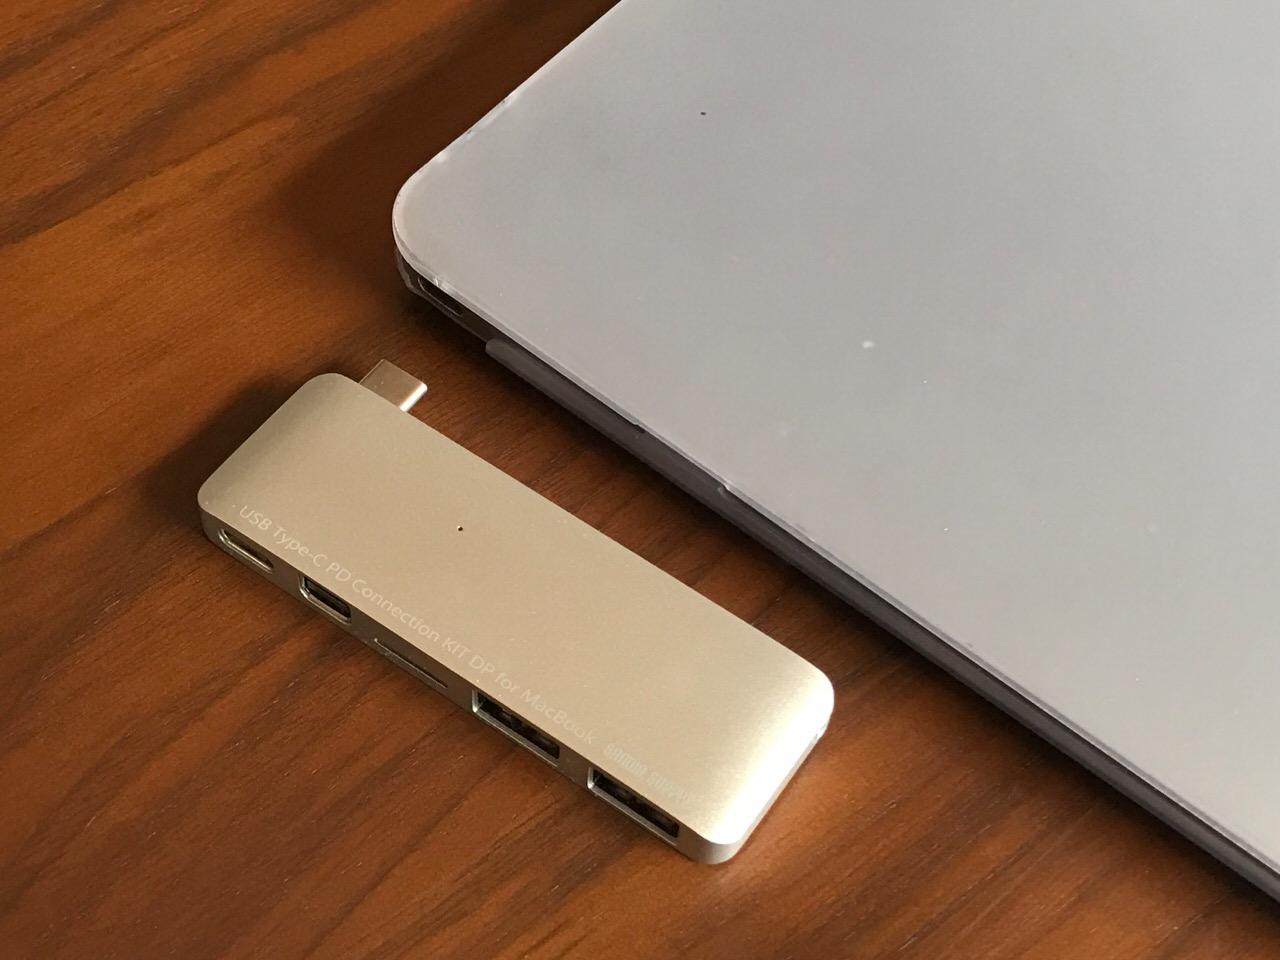 Sanwa supply macbook usb hub 9419